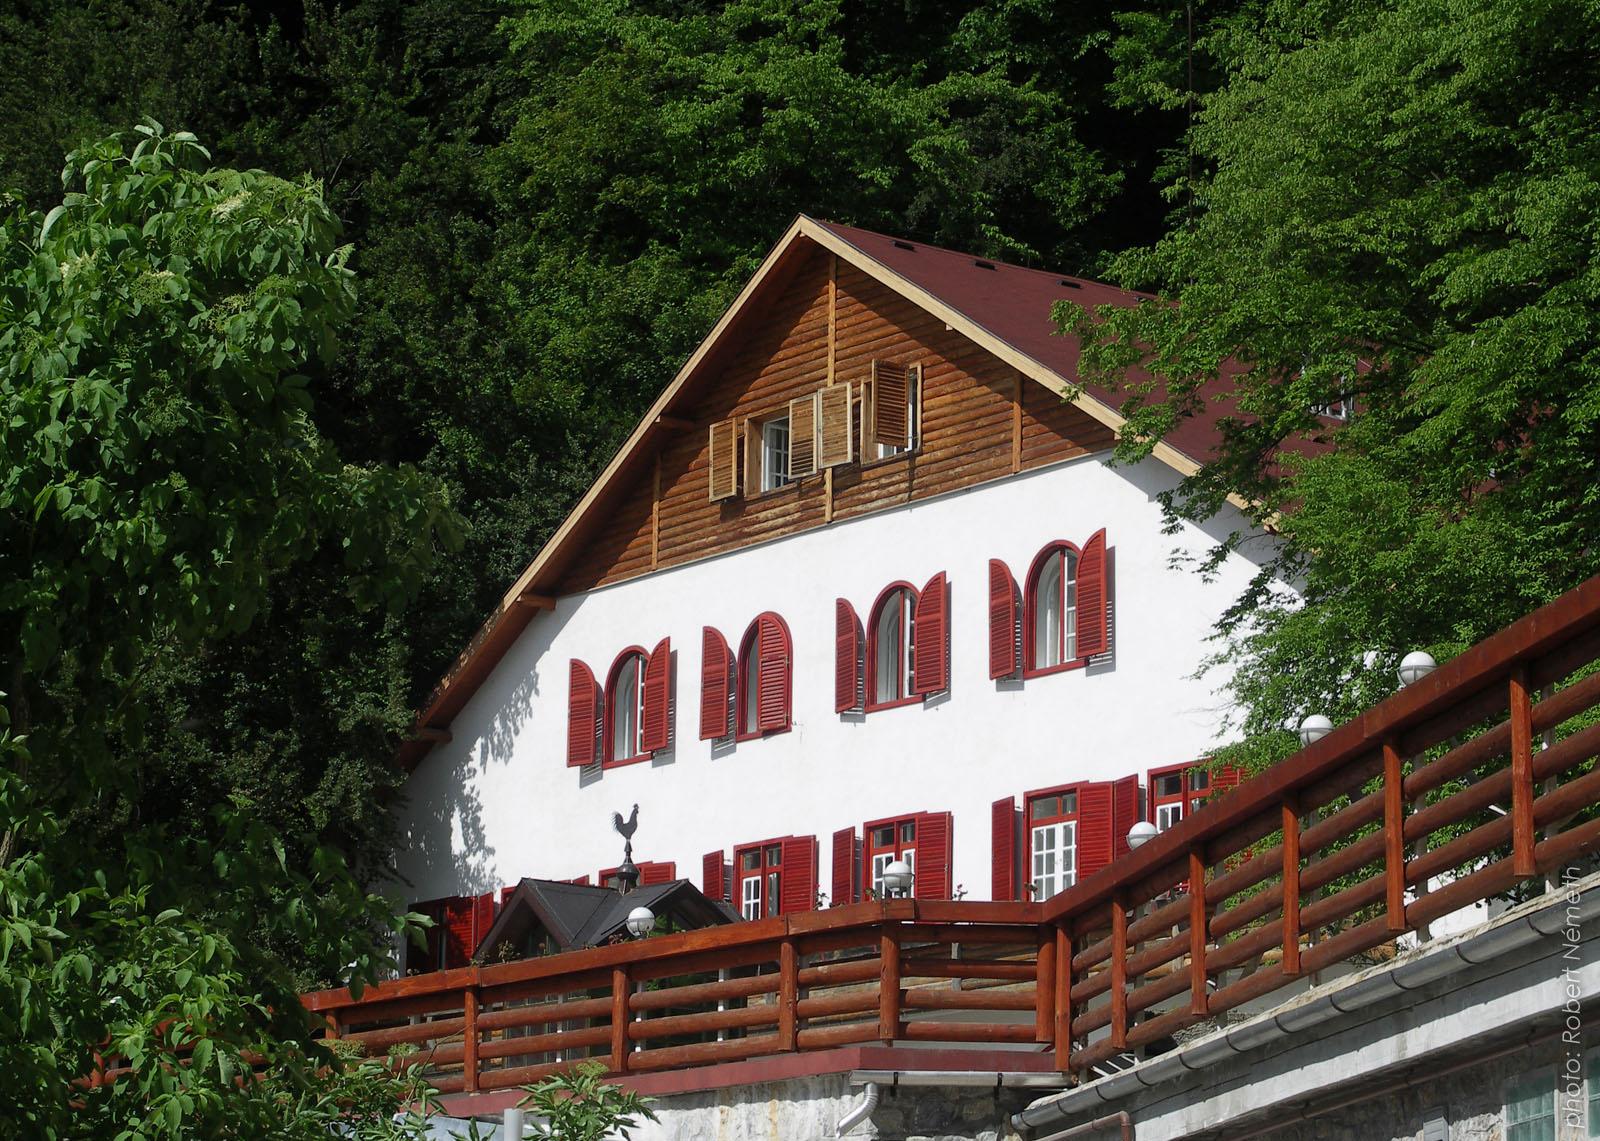 en-josvafo-aggteleki-karszt-aggtelek-national-park-northern-hungary-hungary-panadea-gb-sd-719590-000